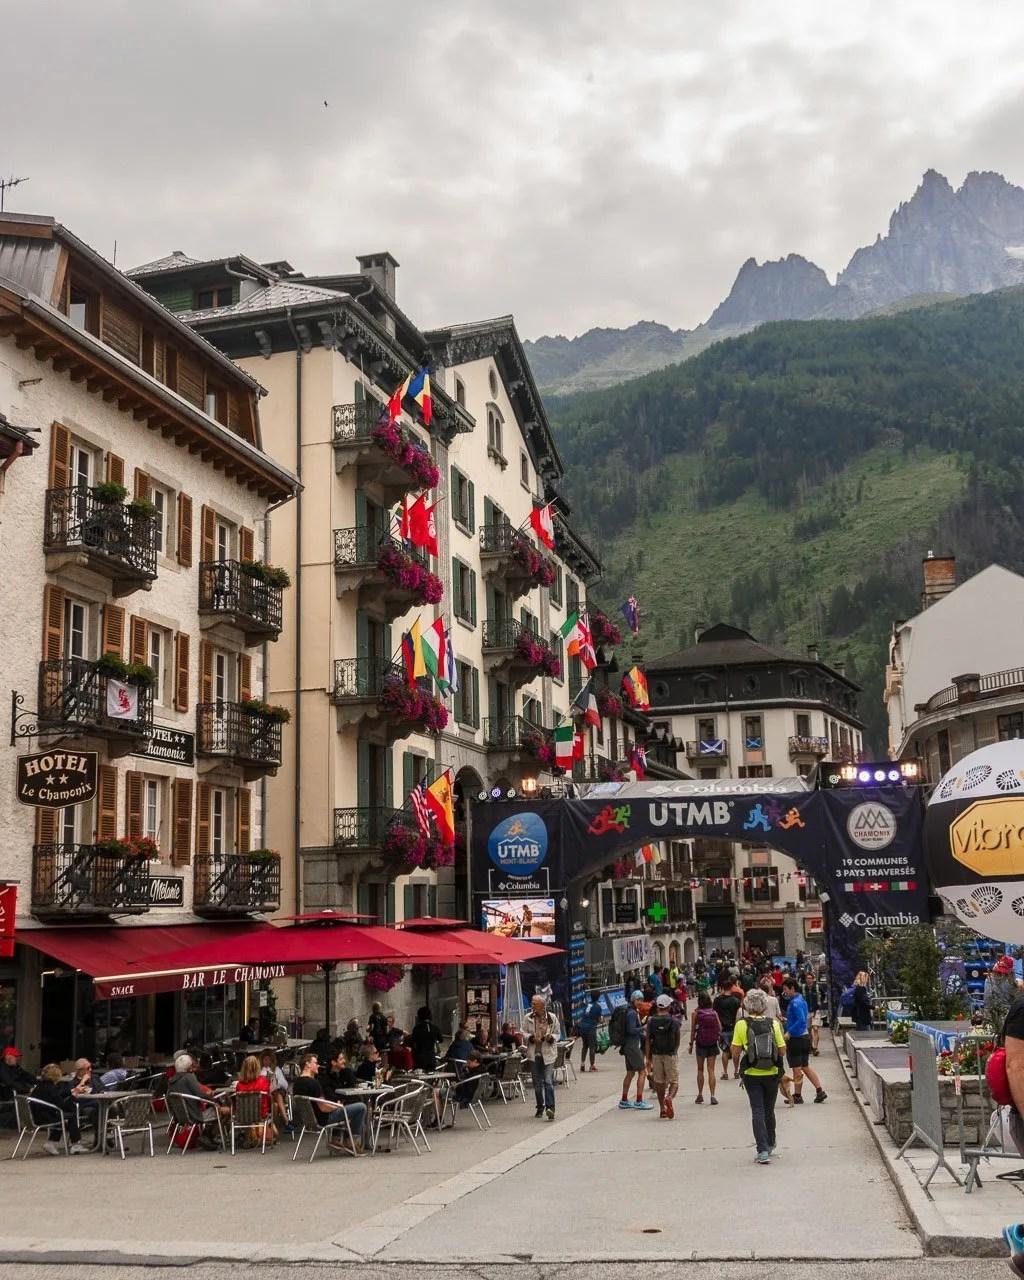 Ultra Tour du Mont Blanc in Chamonix